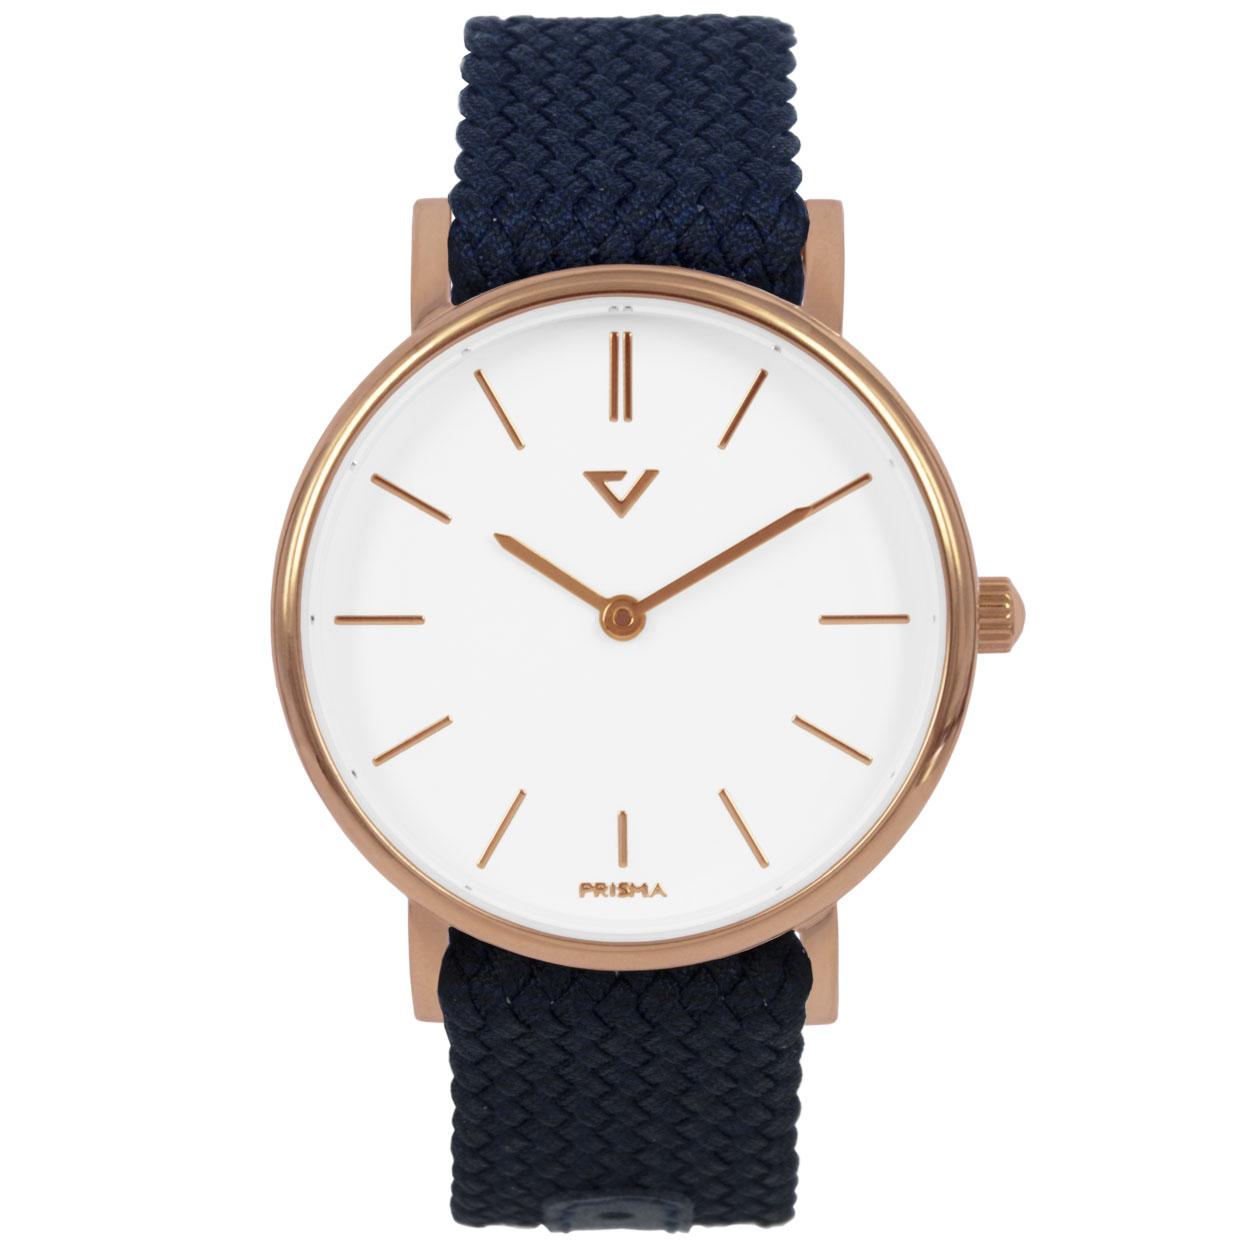 Prisma horloge P.1629.WG22 Lederen band Rose goud